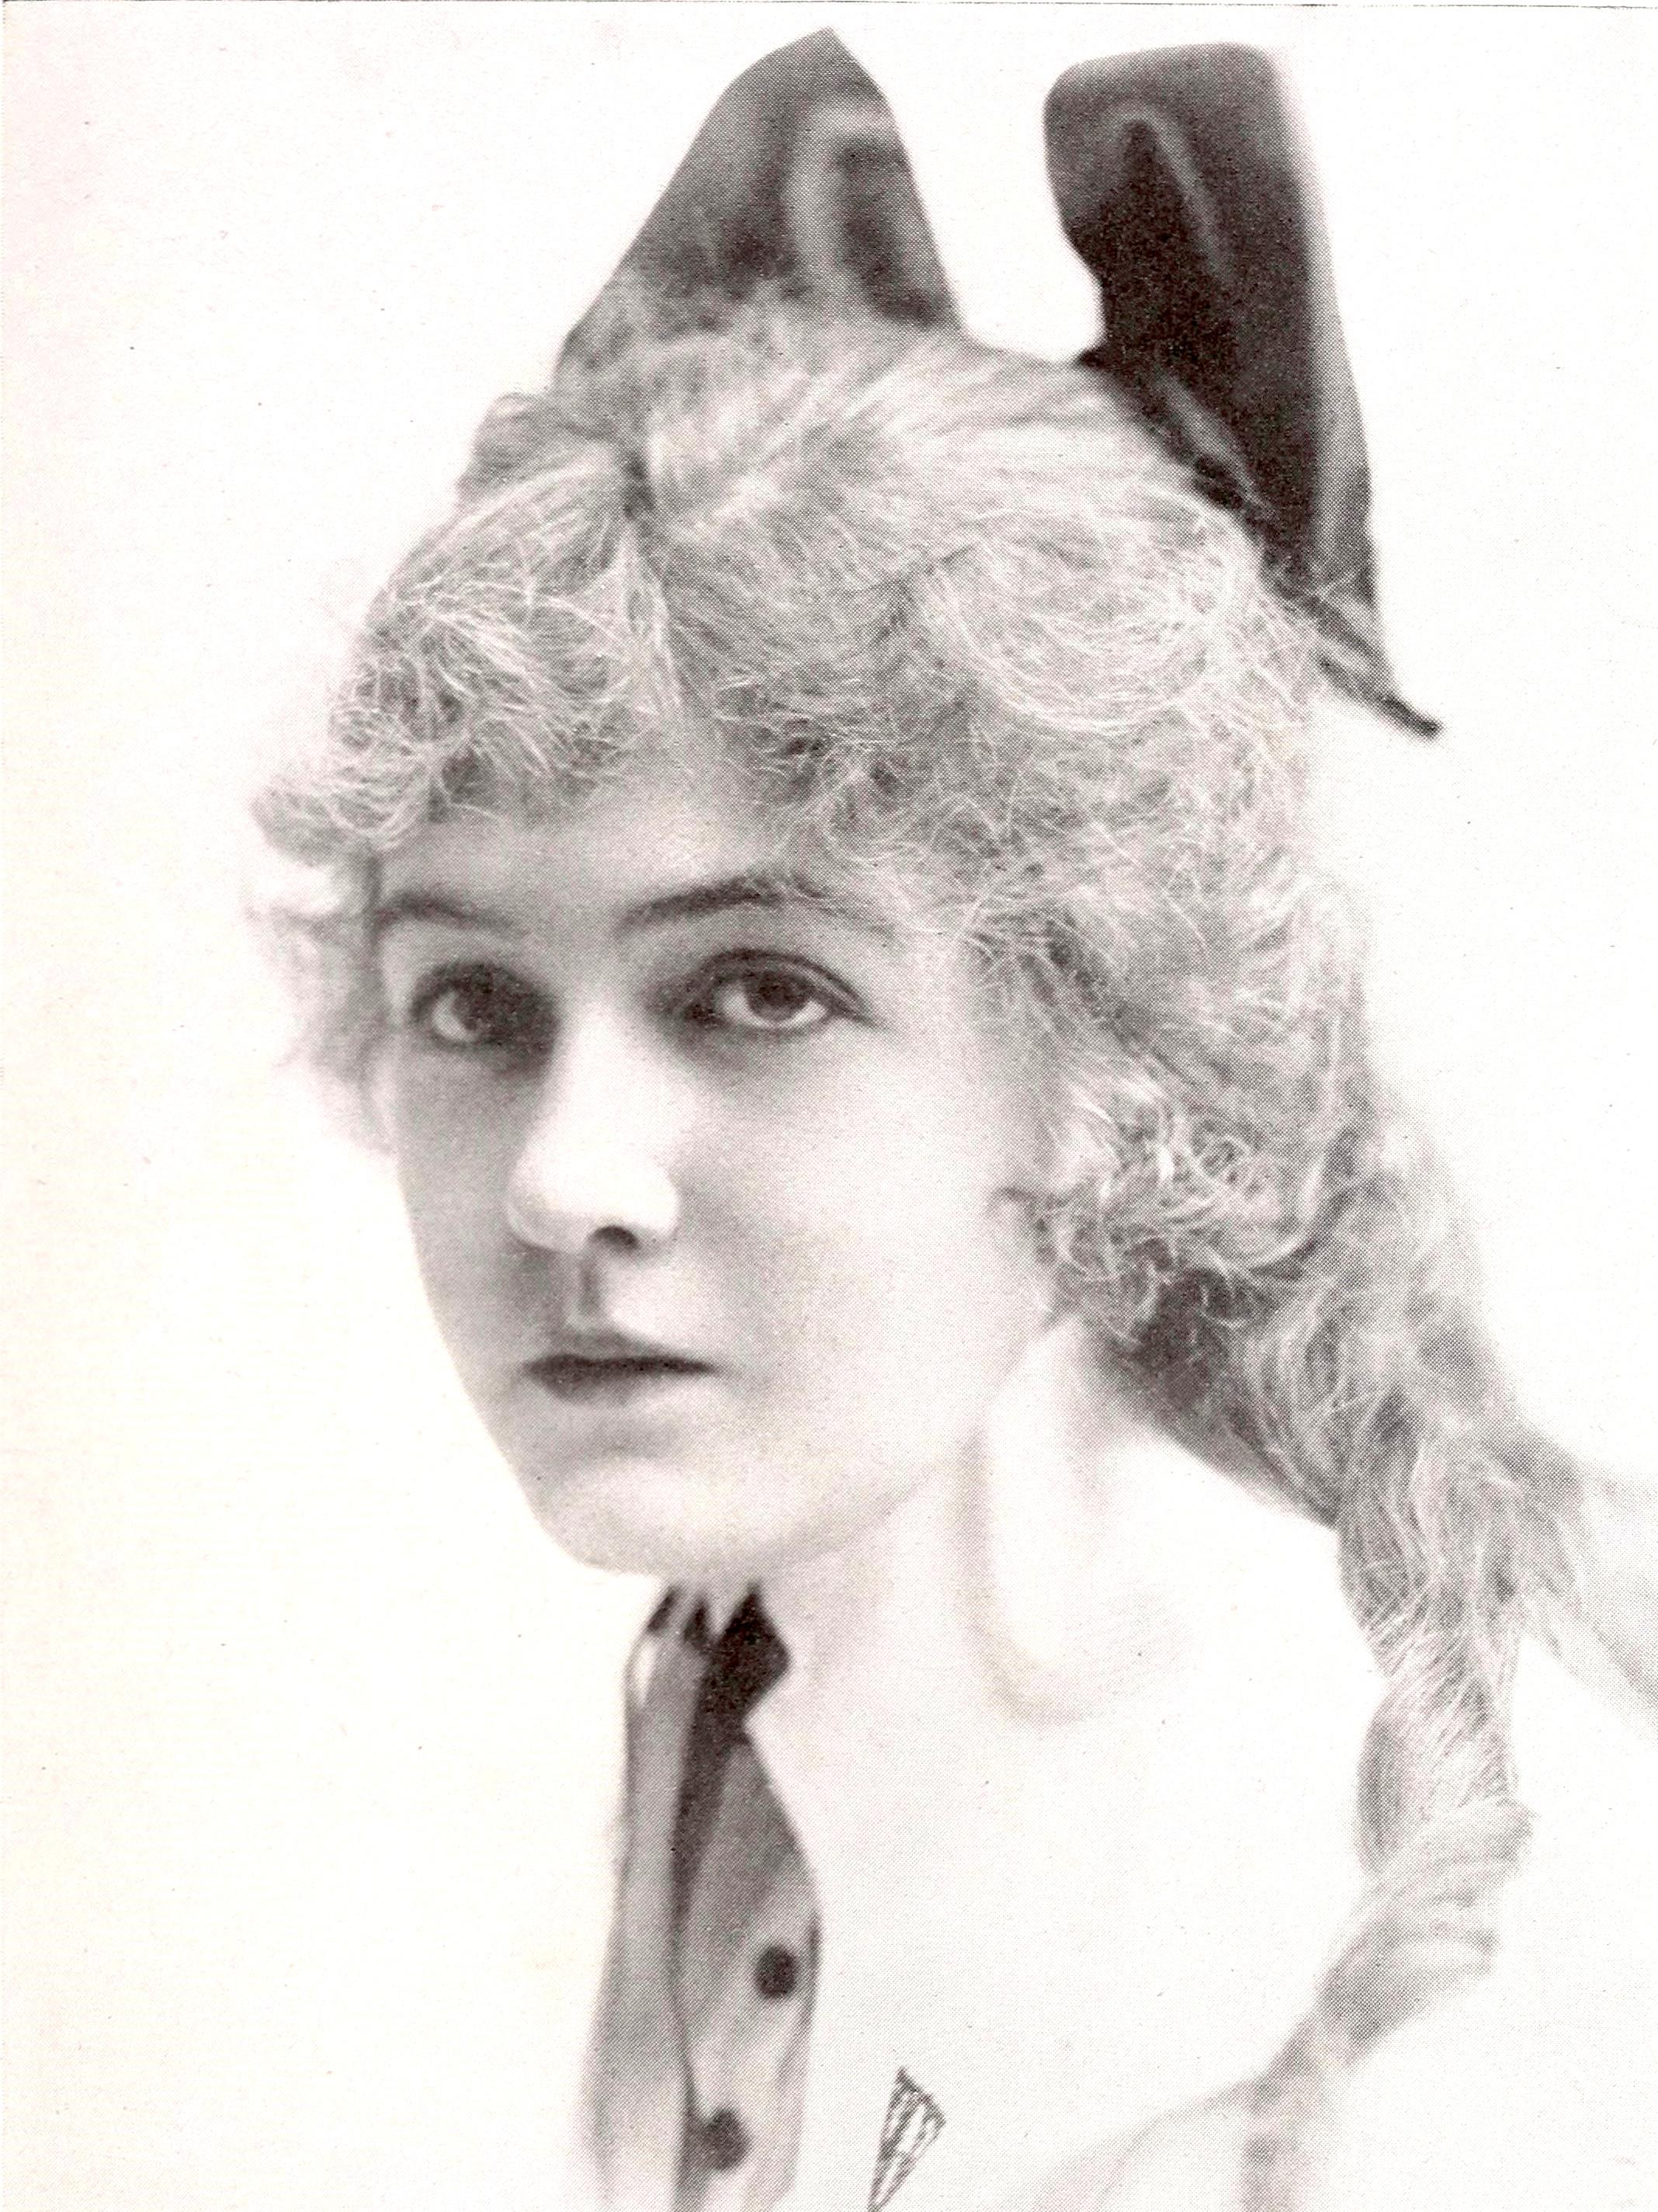 Depiction of Dorothy Gish